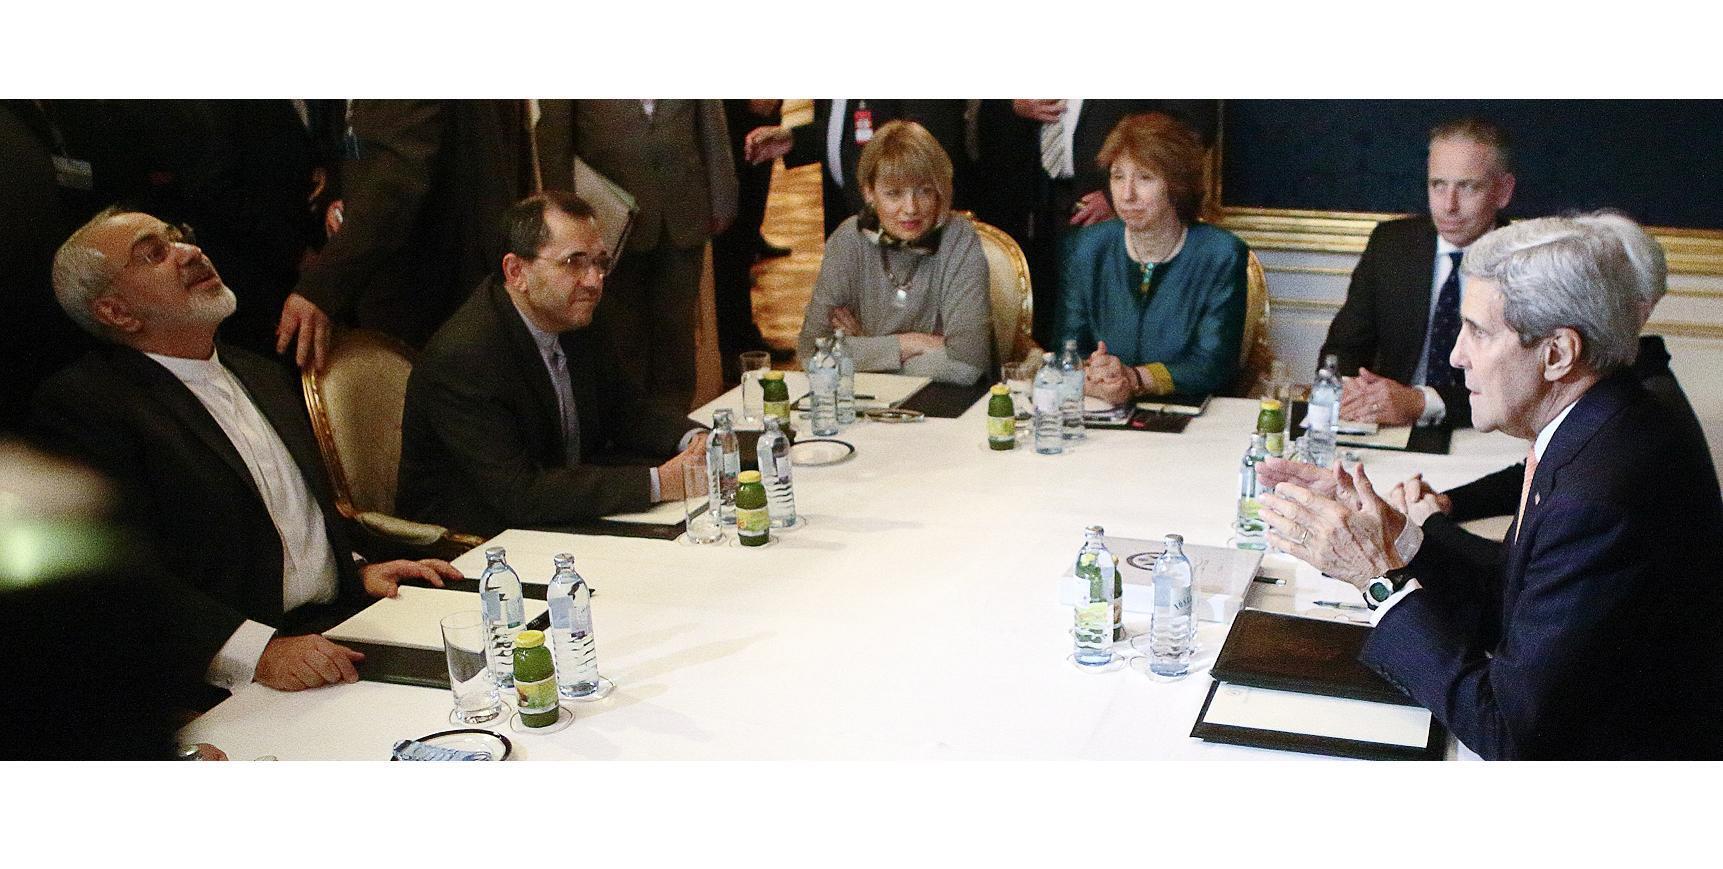 Мохаммед Джавад Зариф, Джон Керри и Кэтрин Эштон на переговорах в Вене 21/11/2014